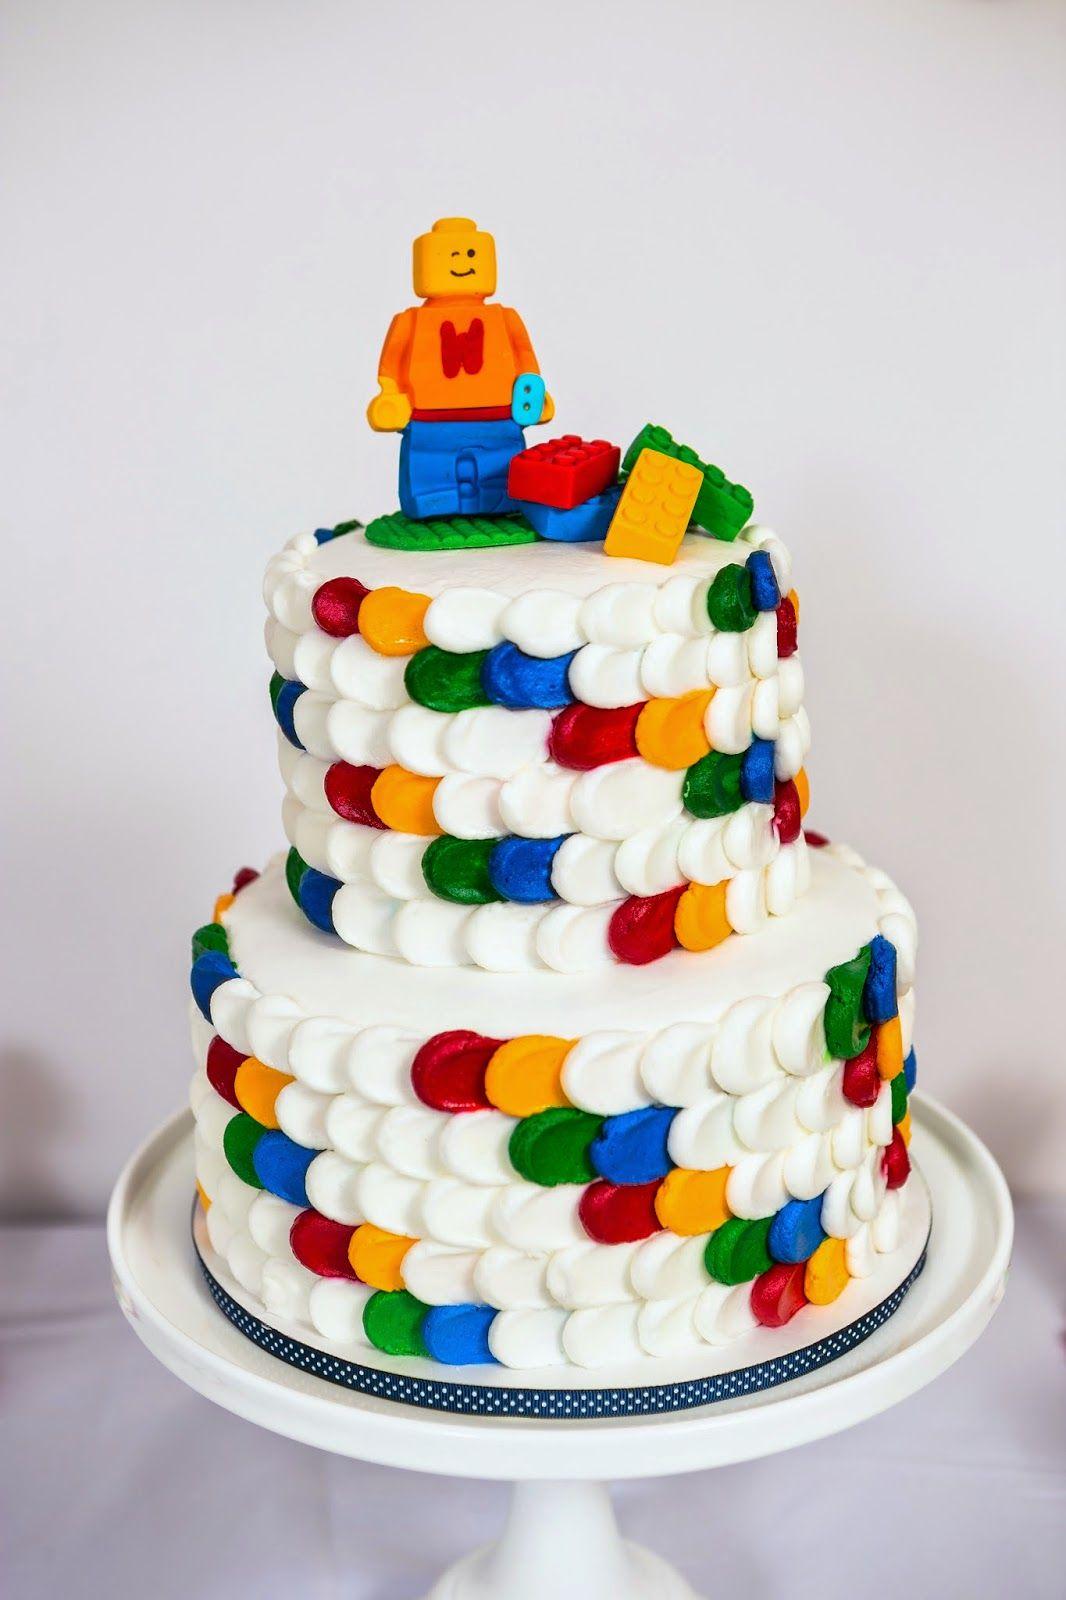 Groovy Walkers 8Th Birthday Lego Party Lego Birthday Cake New Funny Birthday Cards Online Alyptdamsfinfo